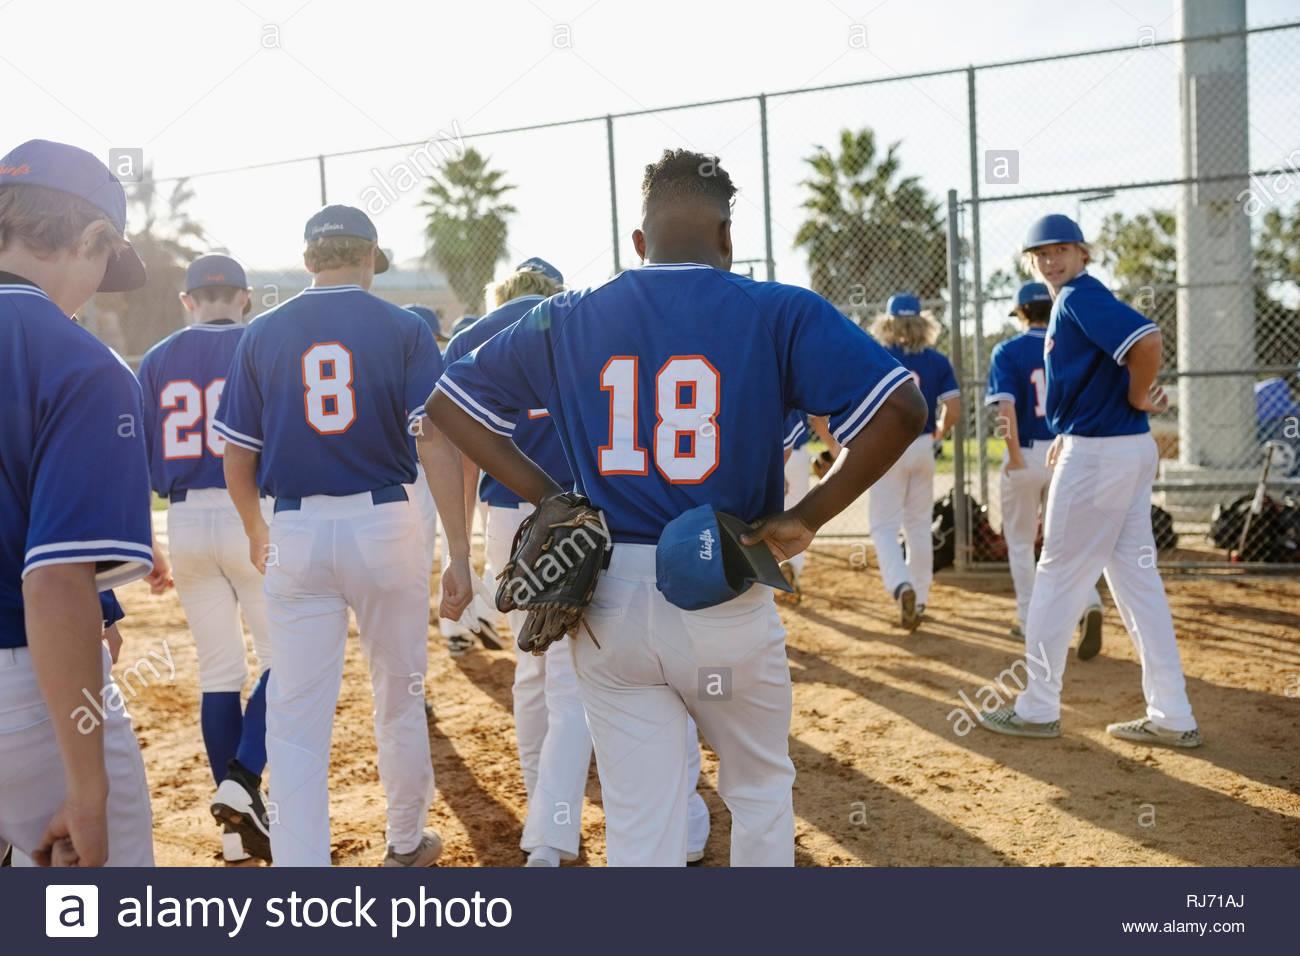 Baseball team walking off field - Stock Image